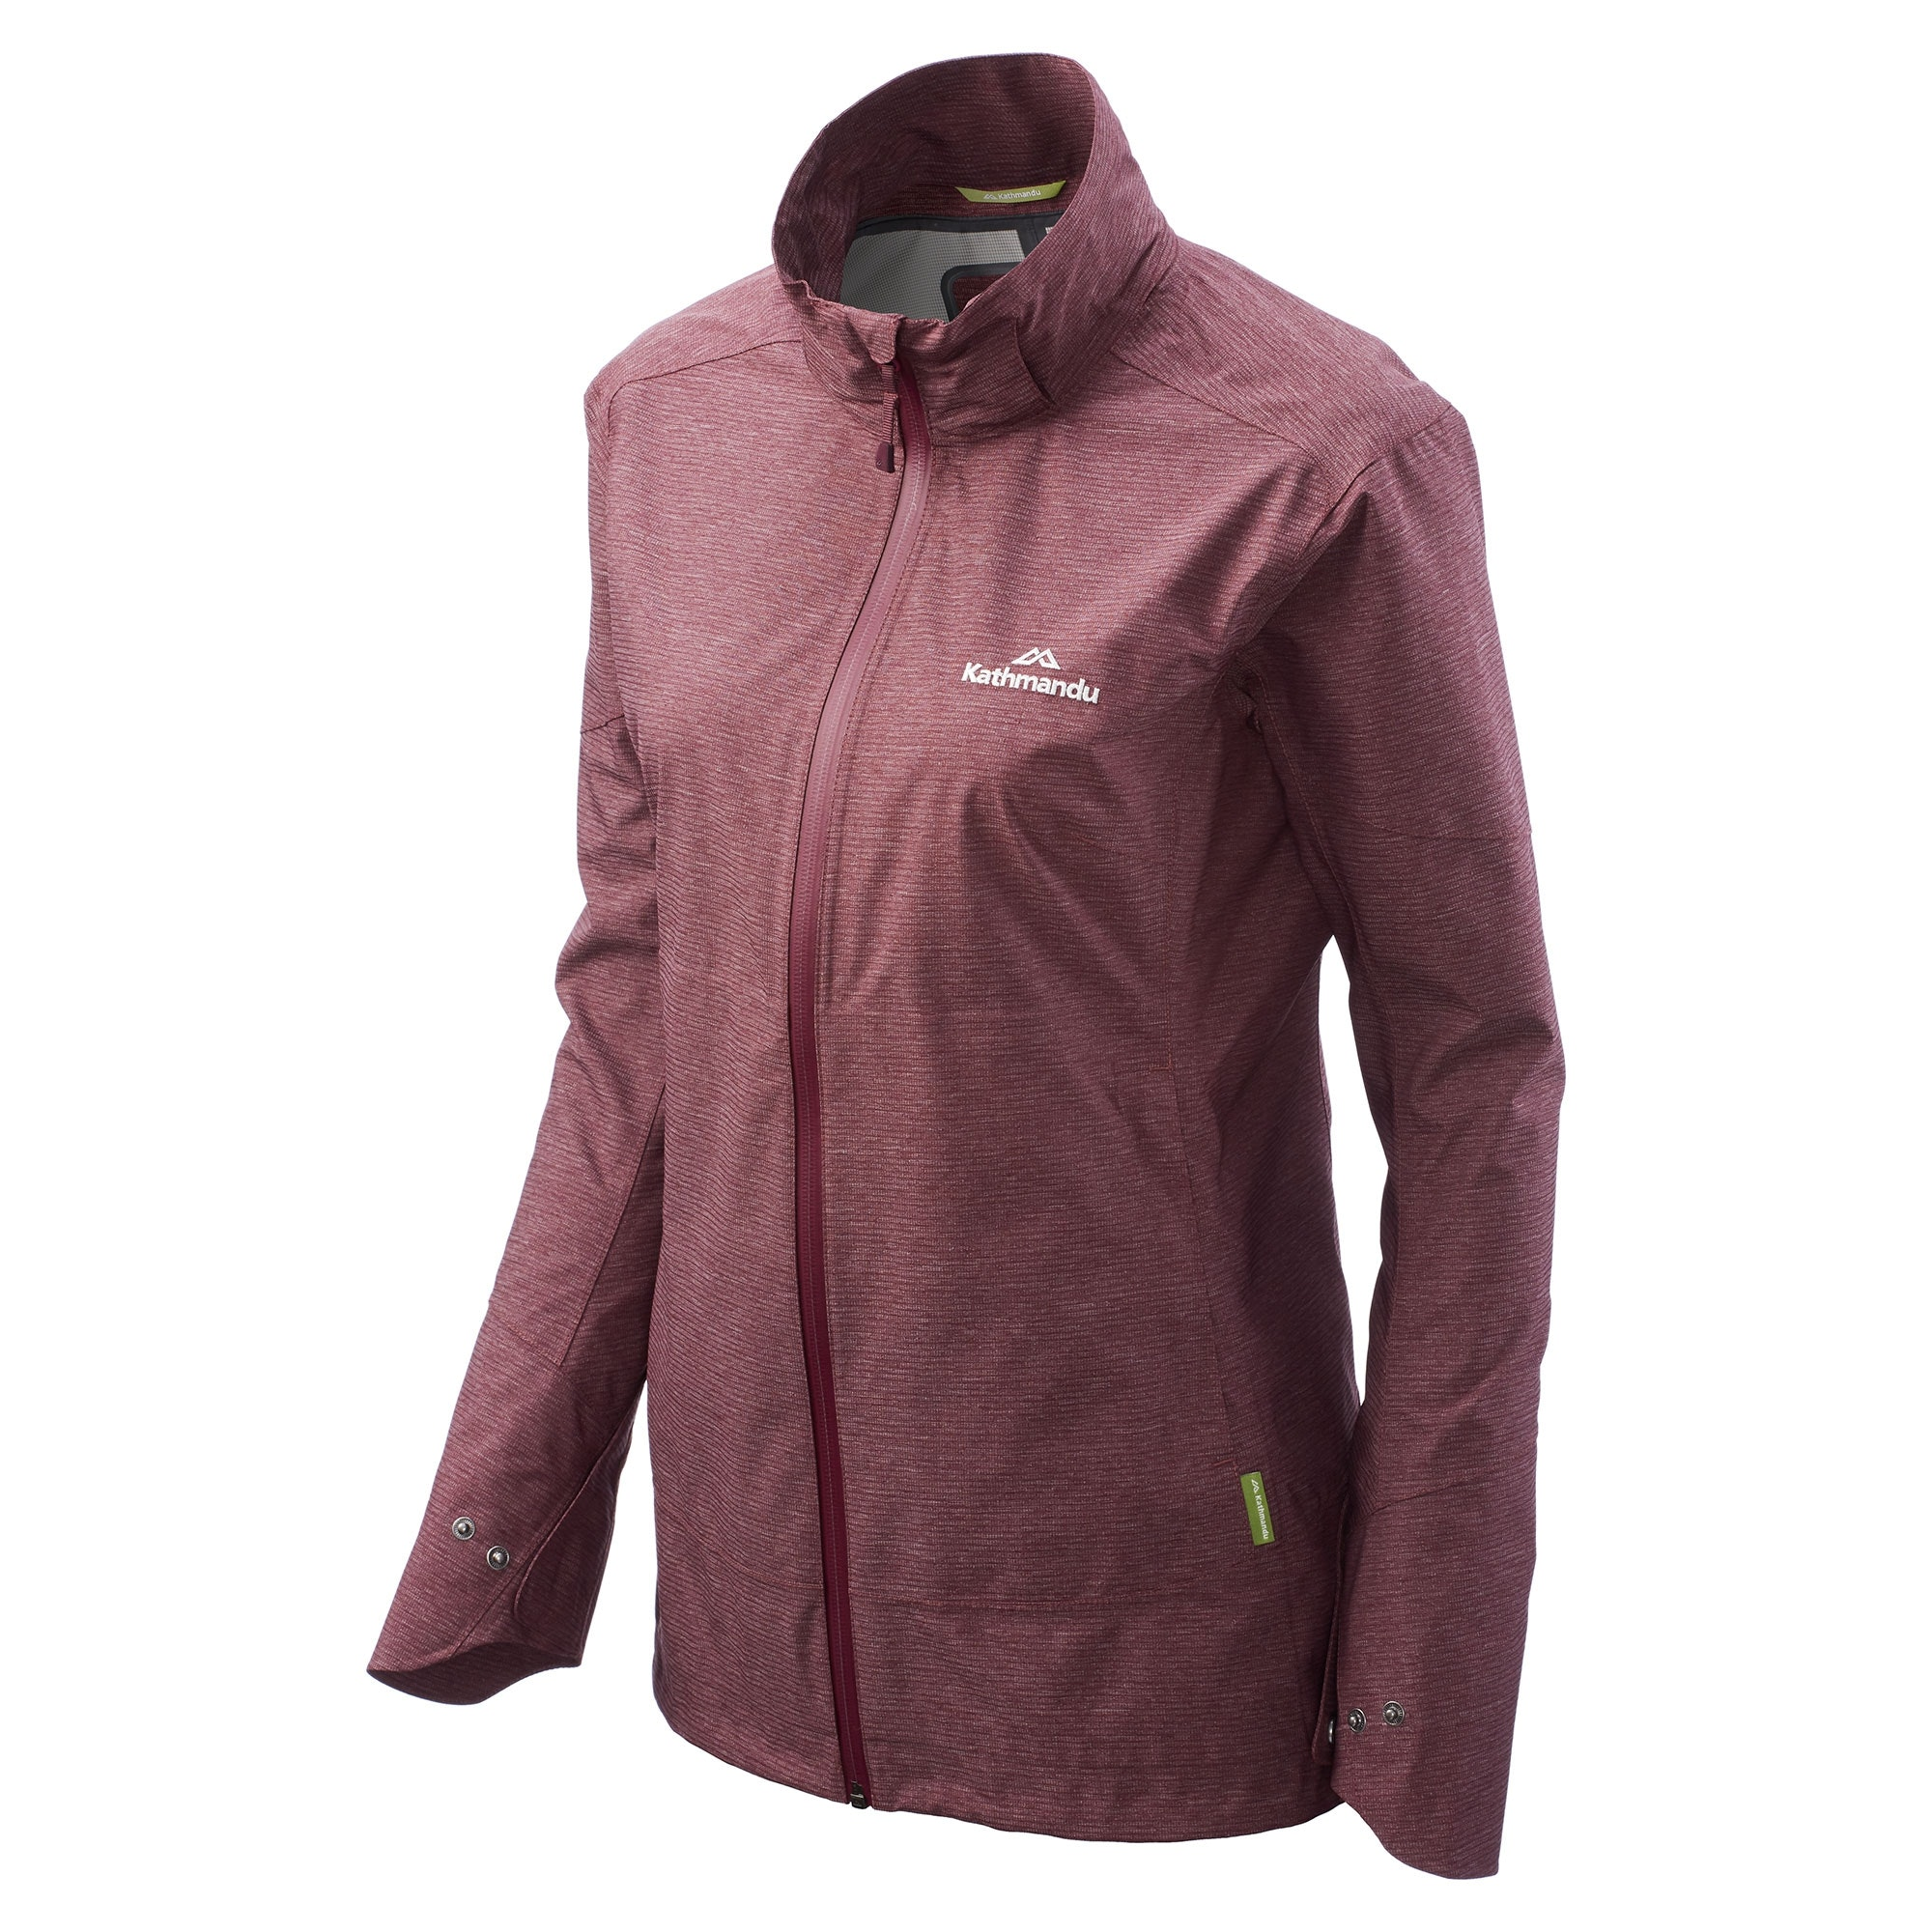 NEW-Kathmandu-Lawrence-Women-039-s-ngx-Windproof-Waterproof-Outdoor-Rain-Jacket-v2 thumbnail 21